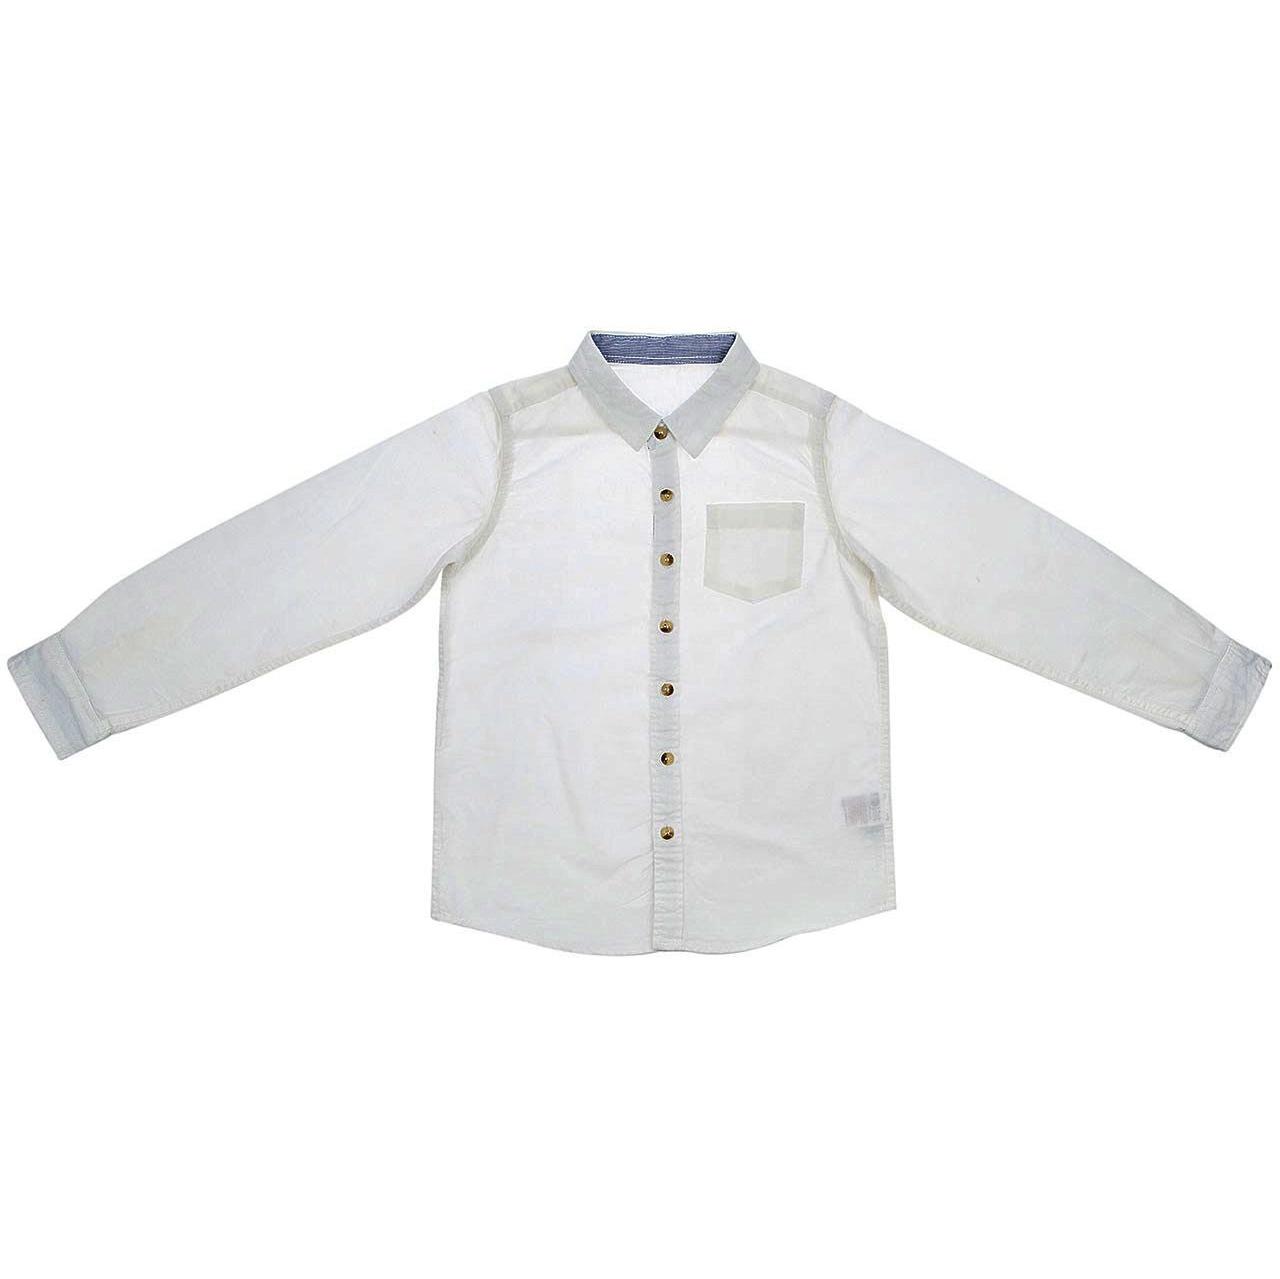 پیراهن پسرانه مادرکر مدل 5711